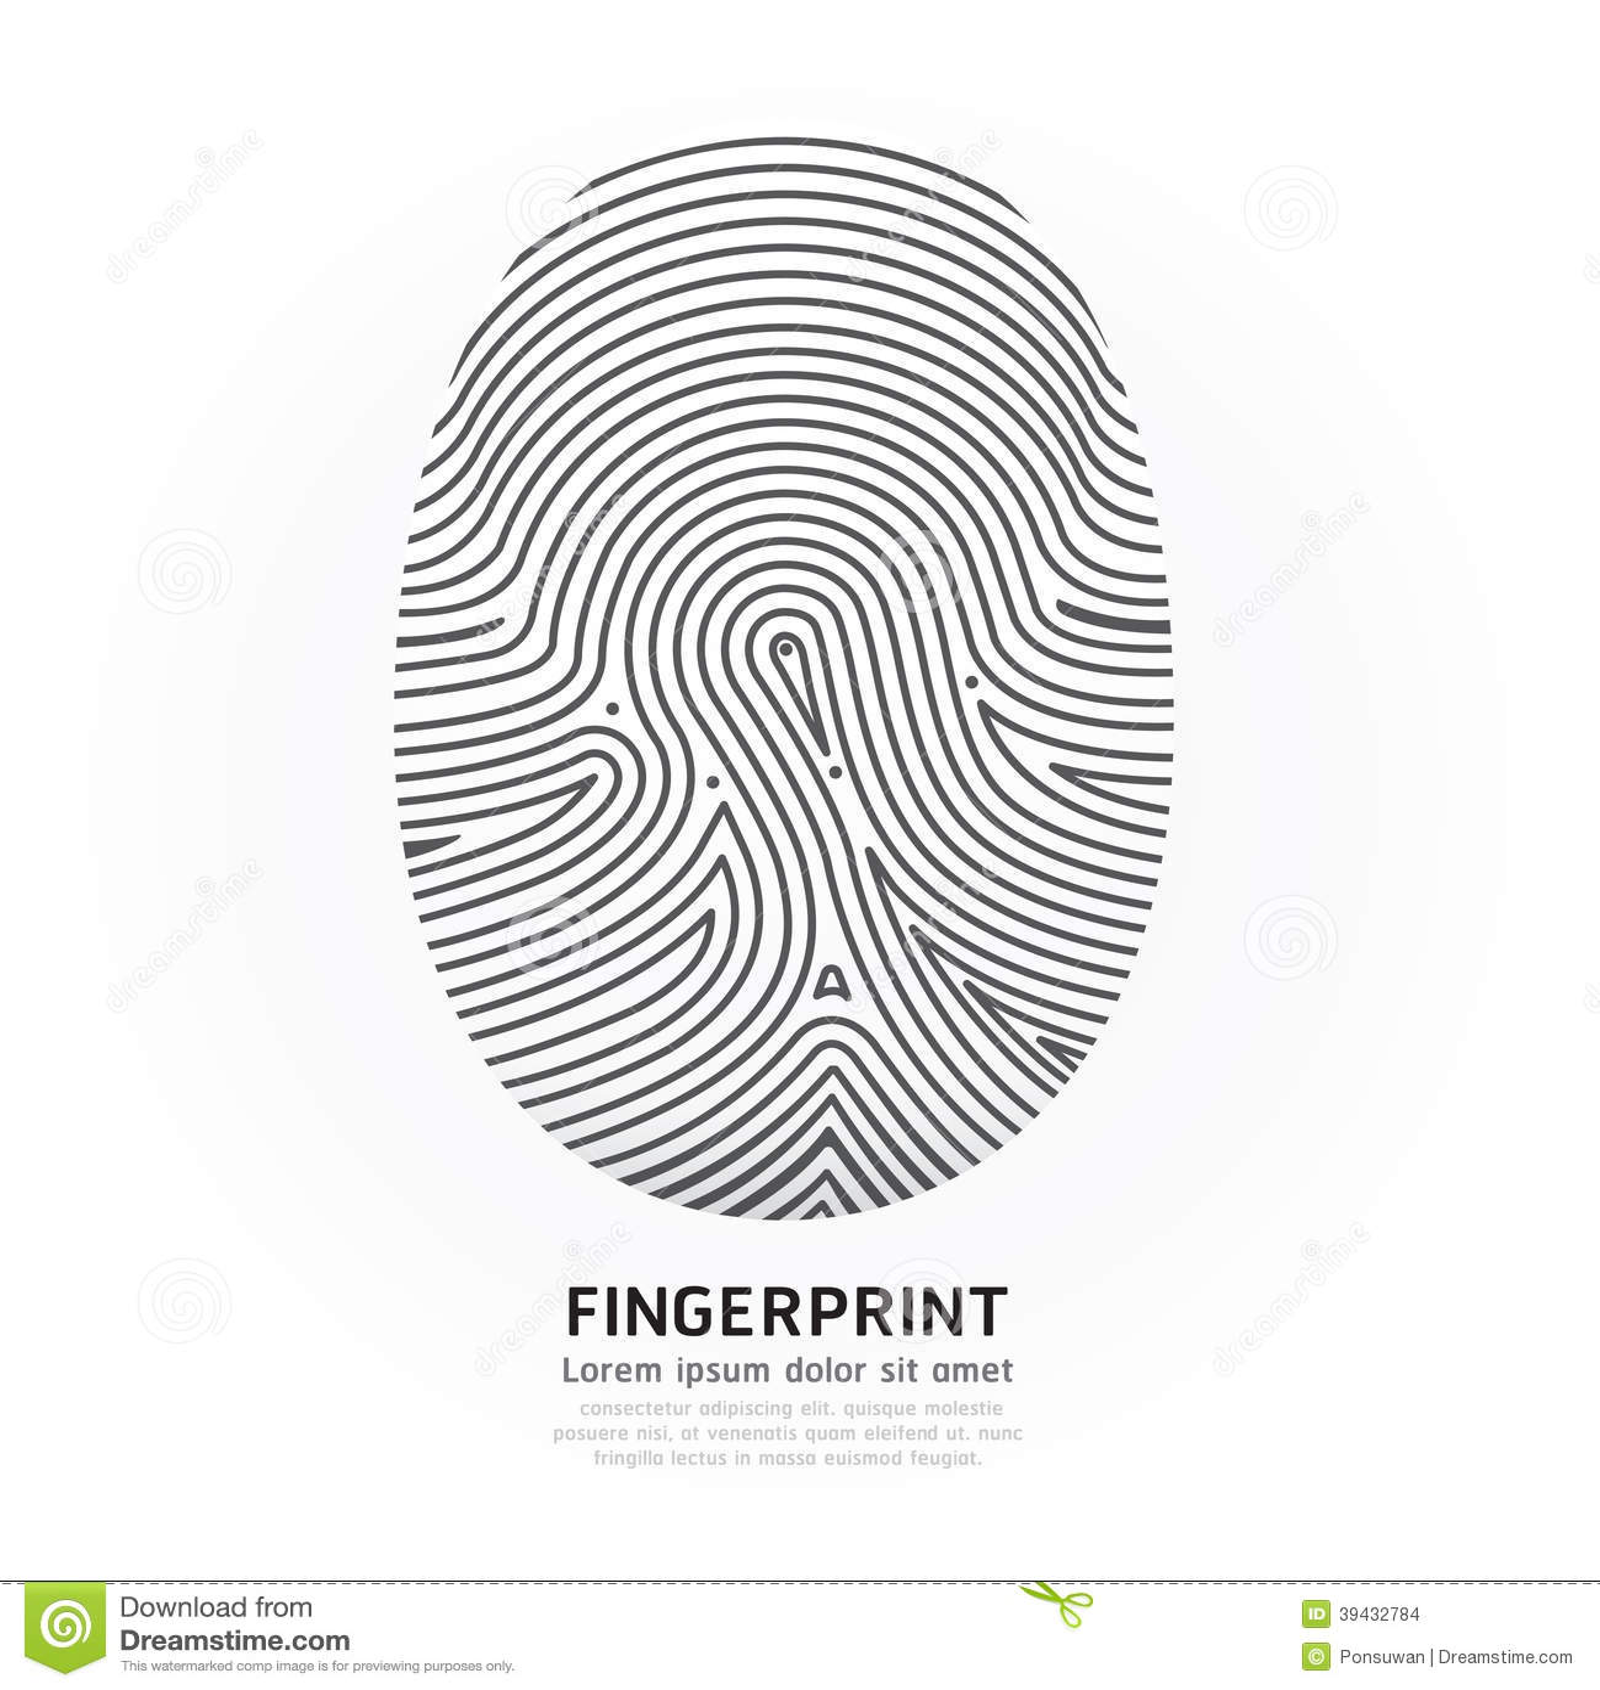 Fingerprint Color Vector Design Illustration Stock Vector